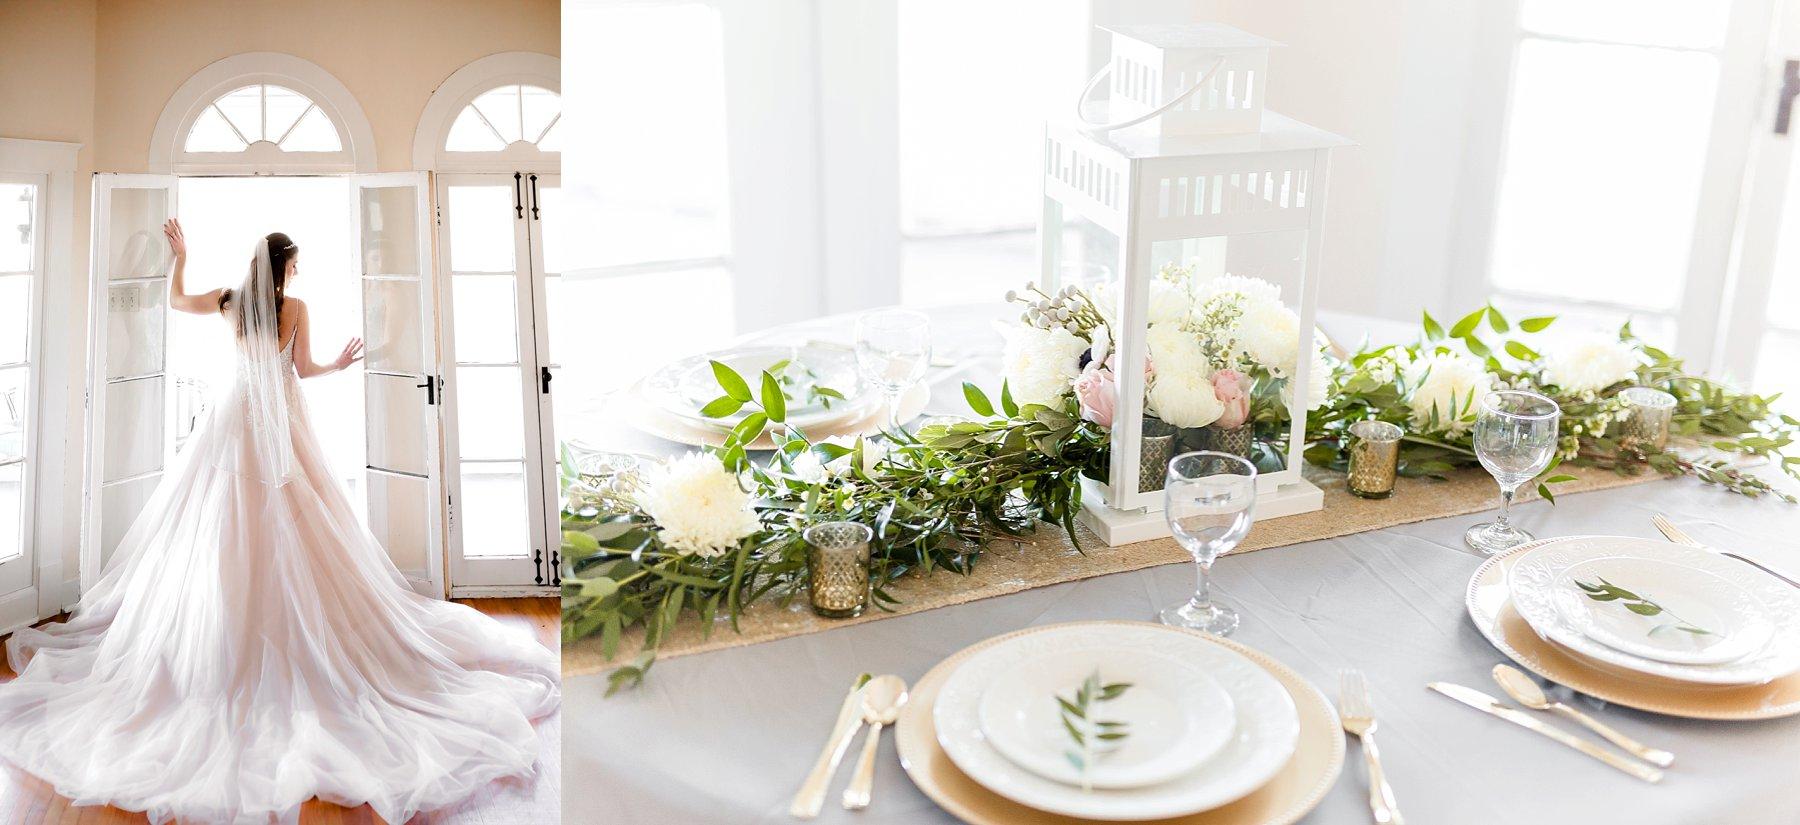 photographer_wedding_saint_louis_Kansas_City_Photography_Videography_workshop_training_styled_engagement_Lake_Ozark_KC_MO_STL_Rolla_Hermann_Saint_James_0430.jpg